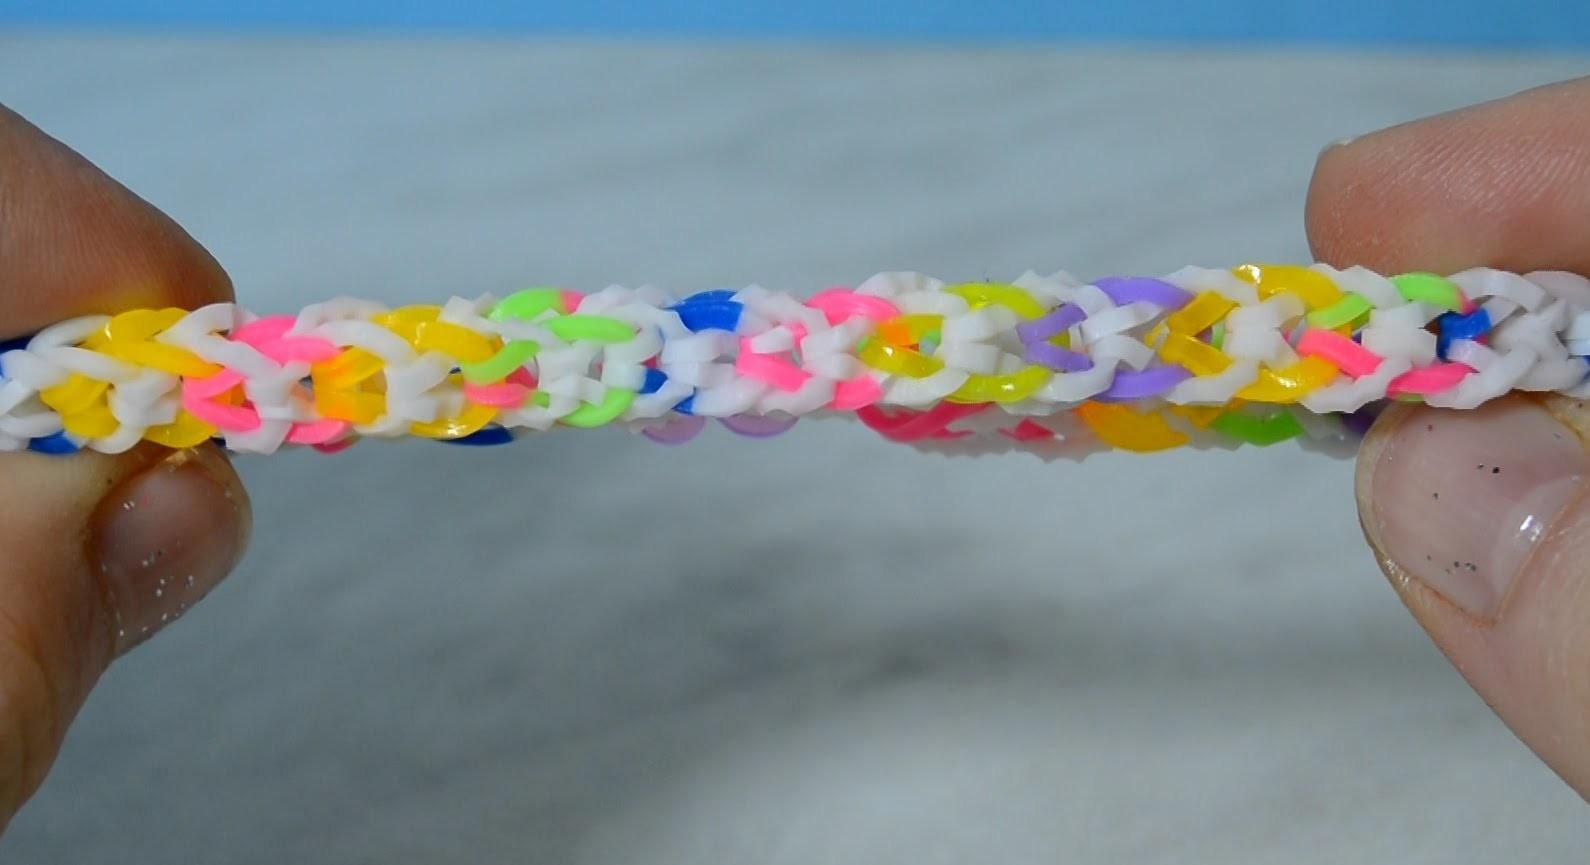 Rainbow Loom Inverted Fishtail Bracelet With Mini Loom-Without Loom